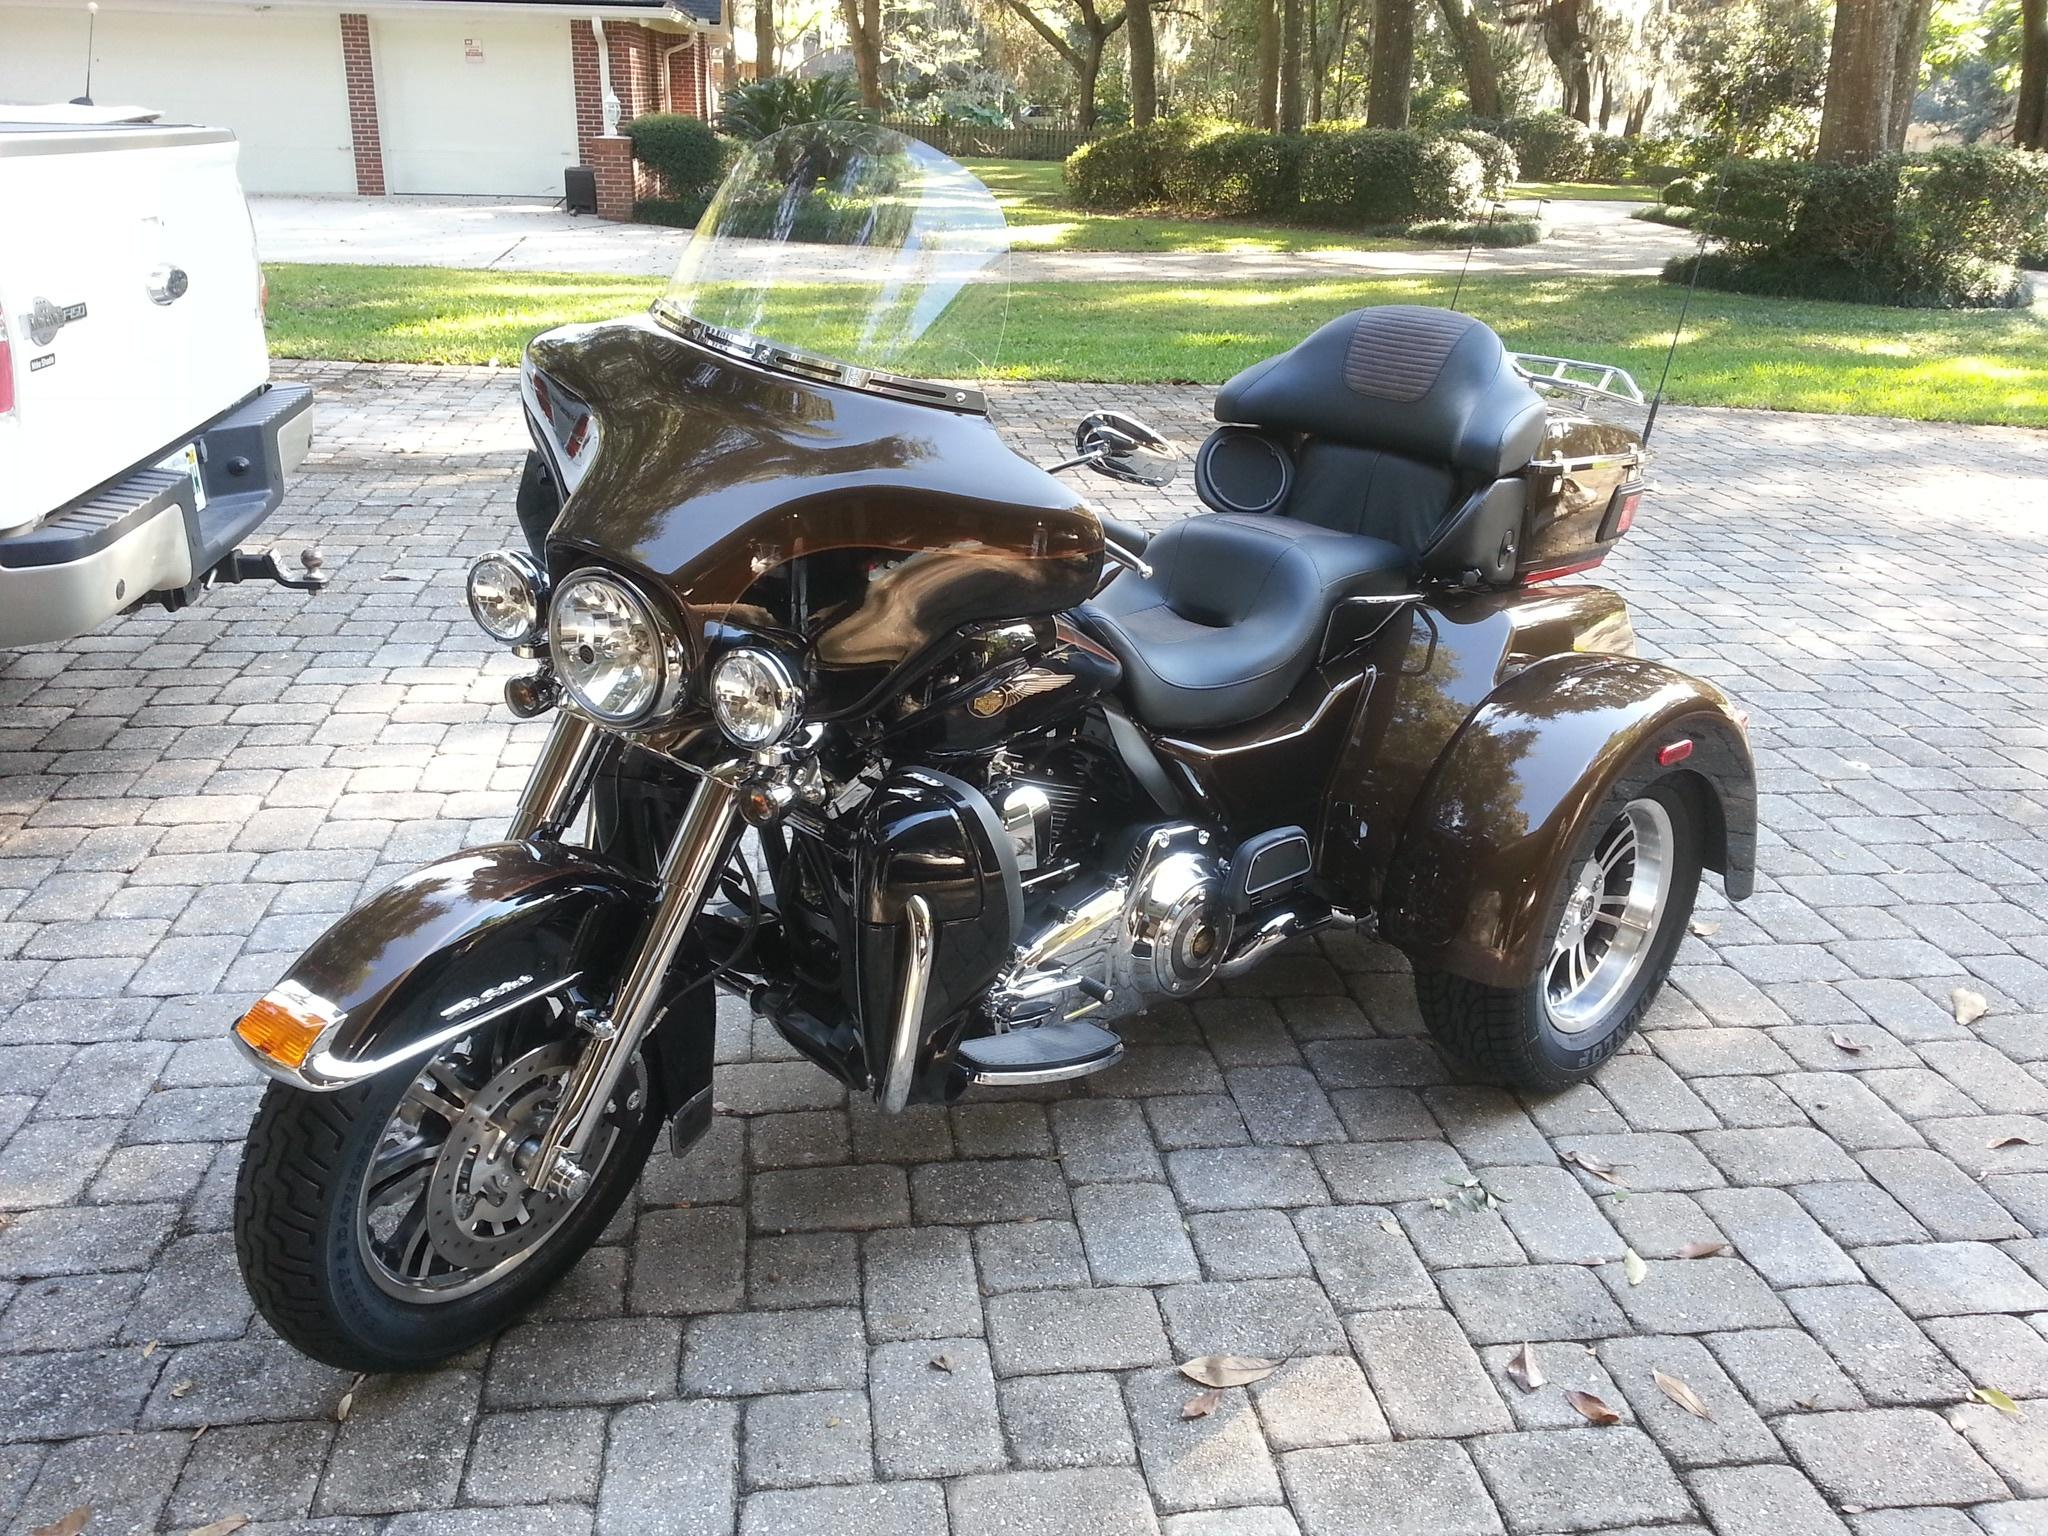 Photo 2013 Harley-Davidson TRI GLIDE ULTRA CLASSIC $415.00415.00